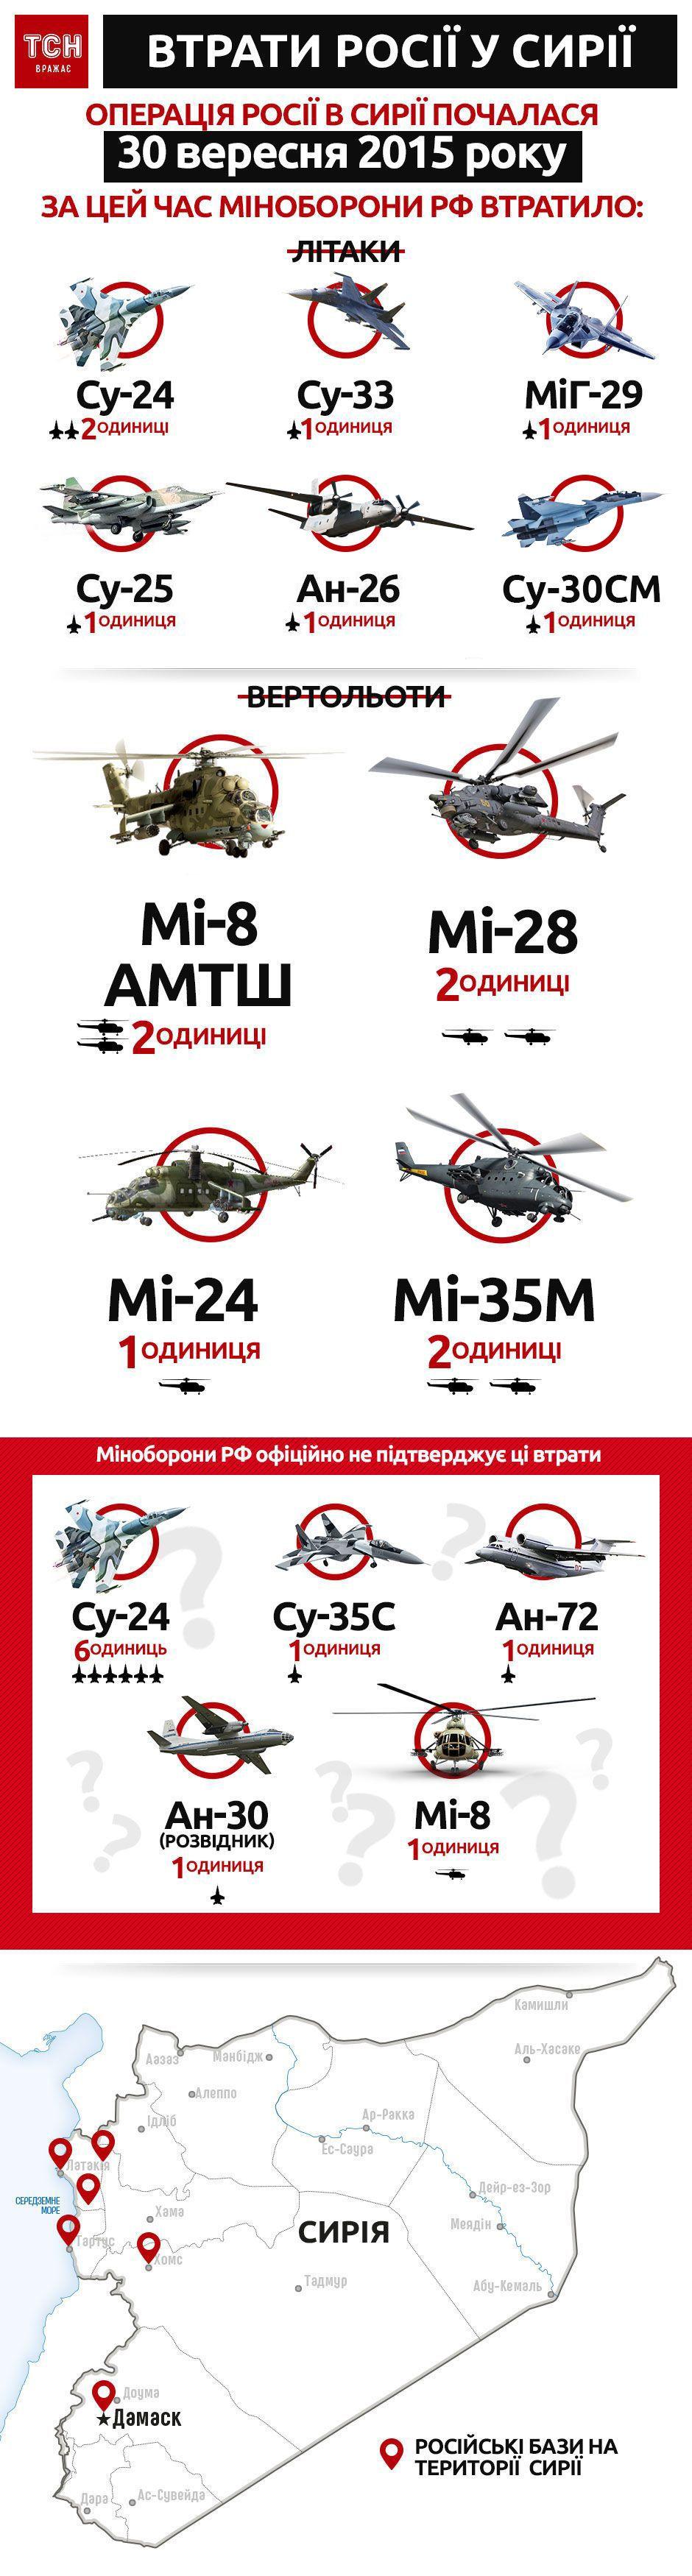 Beregning av Russlands tap av militære fly i Syria